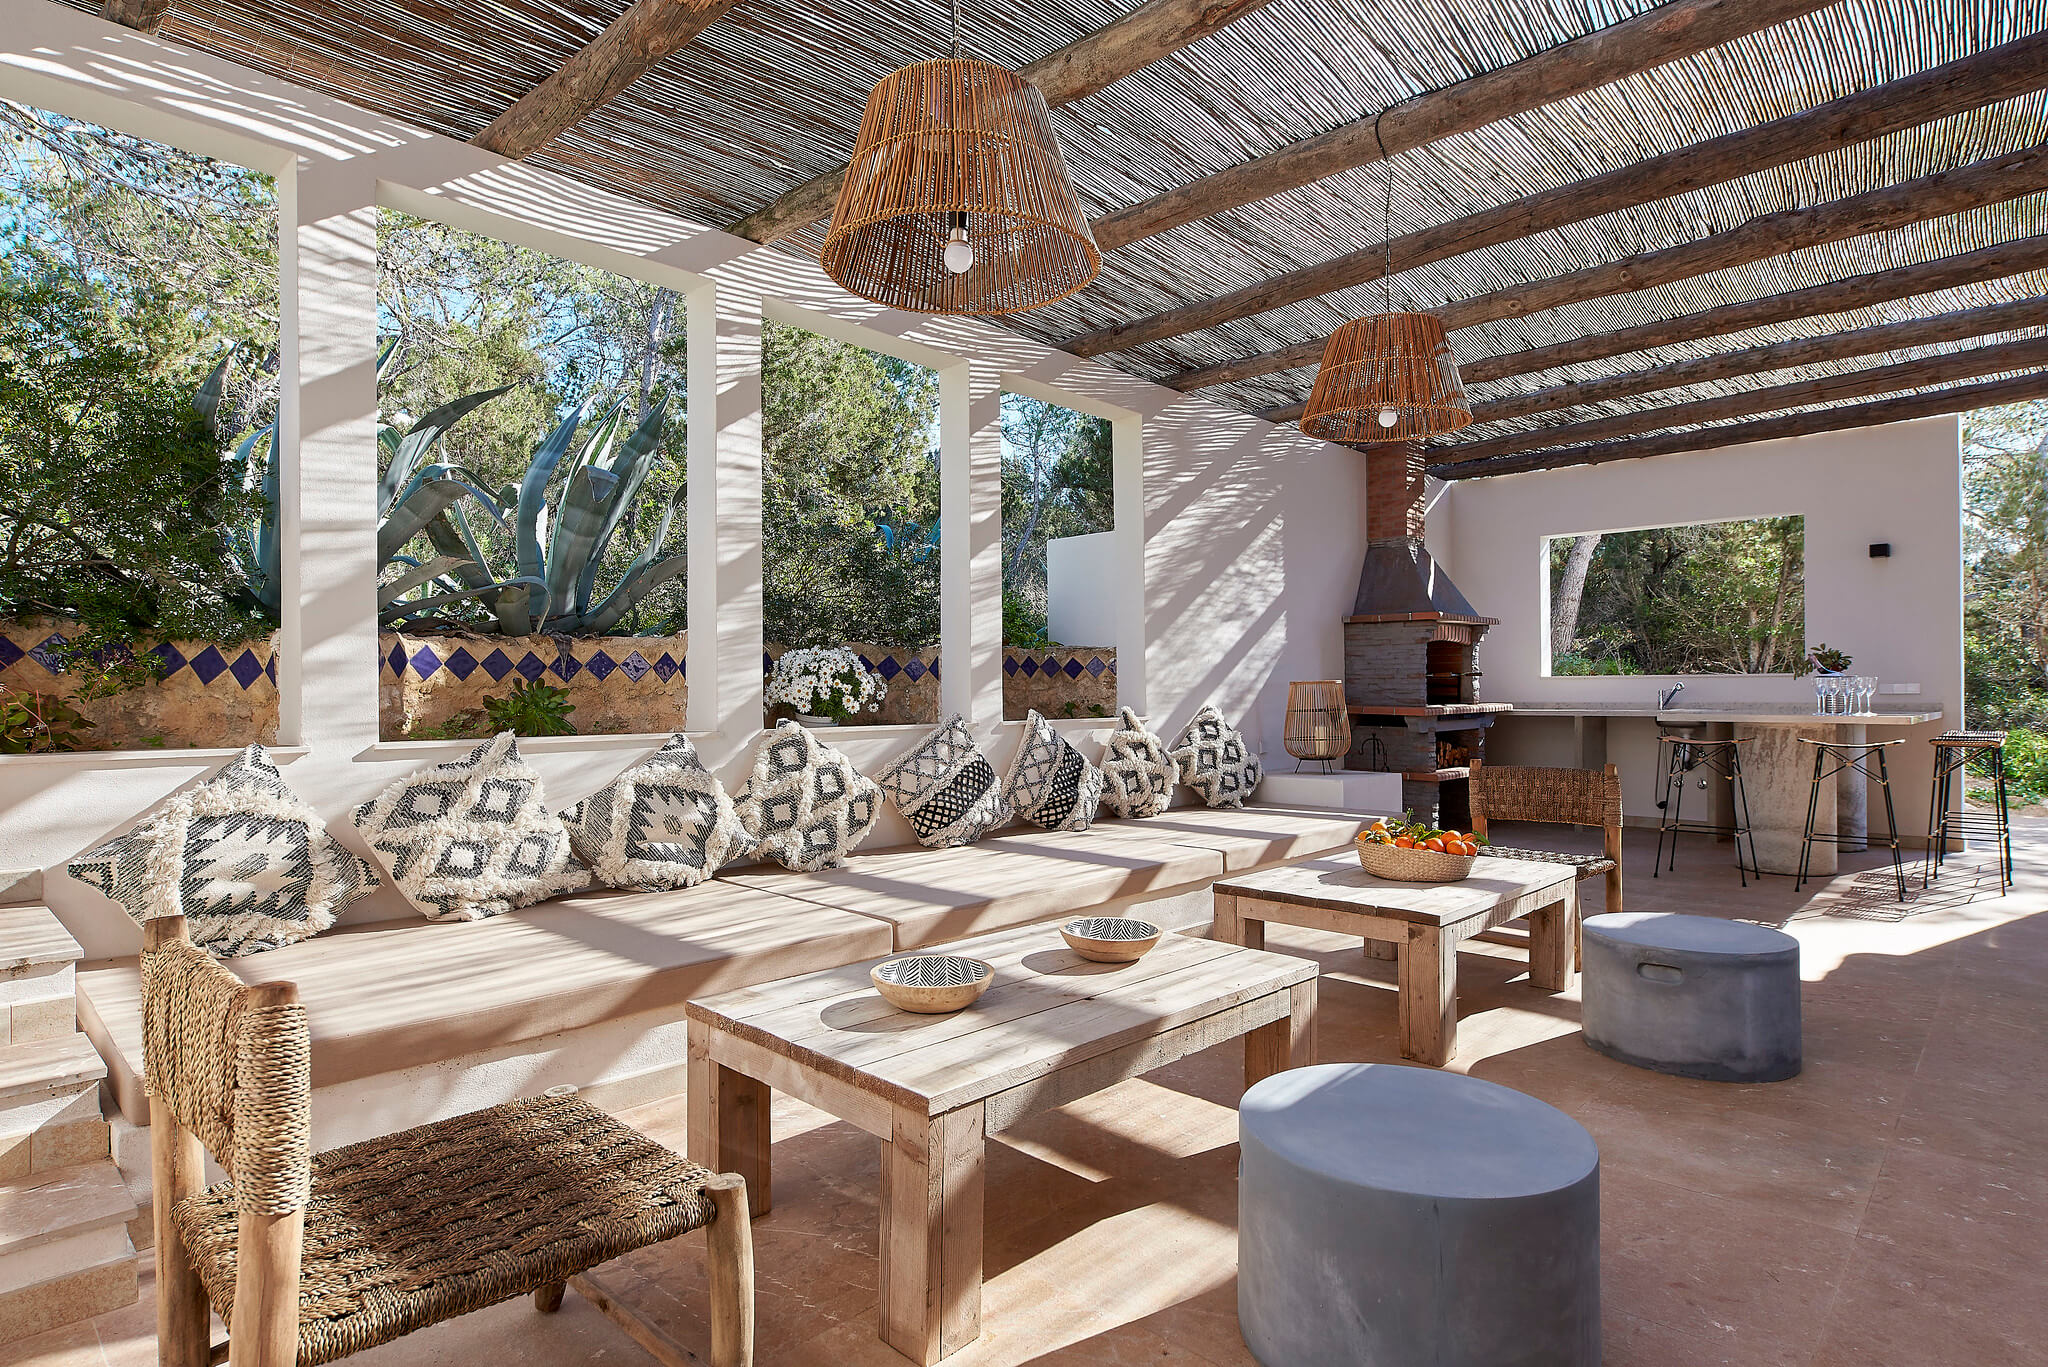 https://www.white-ibiza.com/wp-content/uploads/2020/06/white-ibiza-villas-sa-serra-interior-back-terrace.jpg